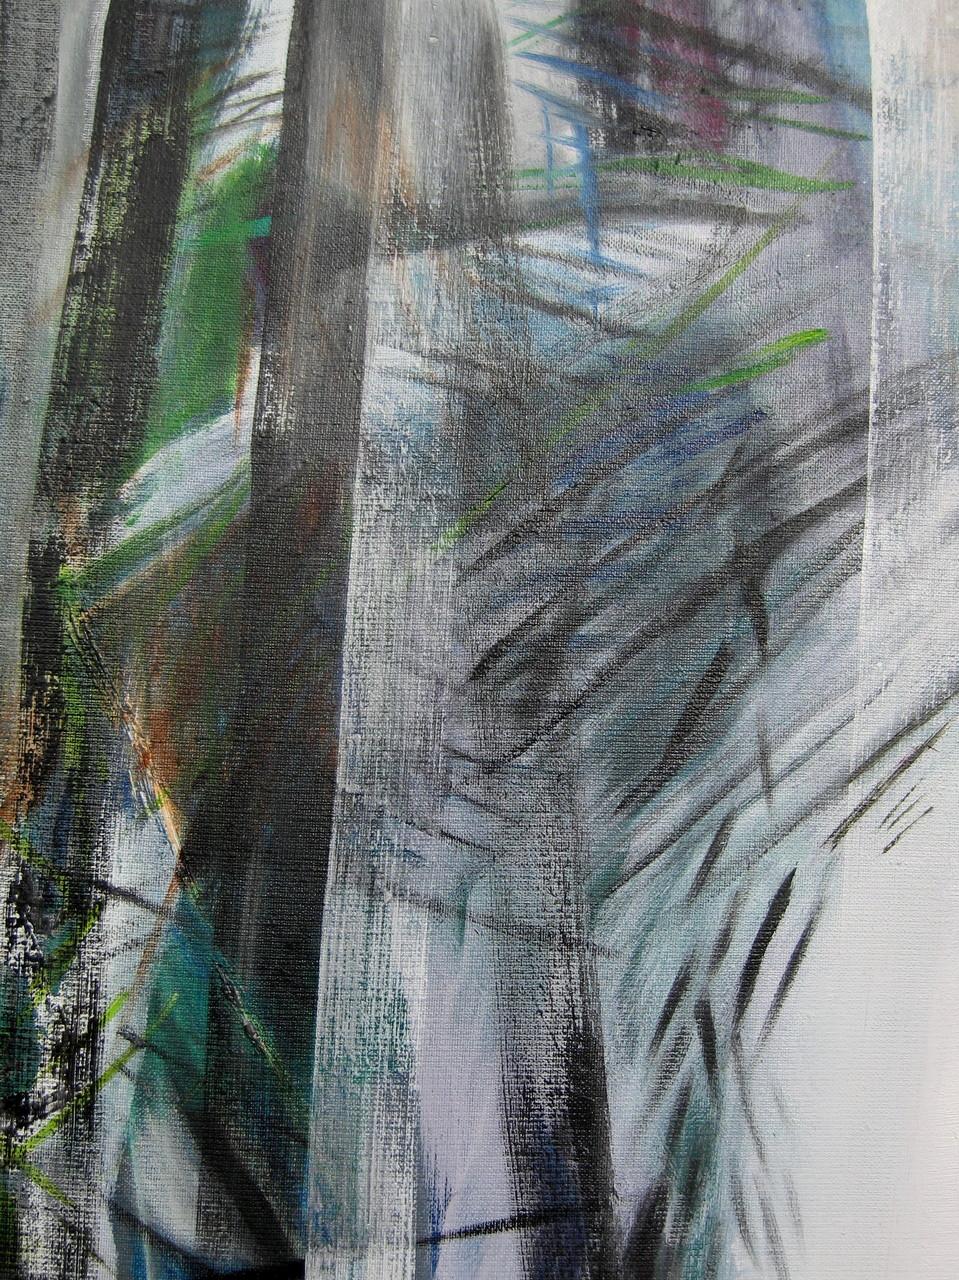 Schnee II, Öl auf Leinwand, 50 x 40